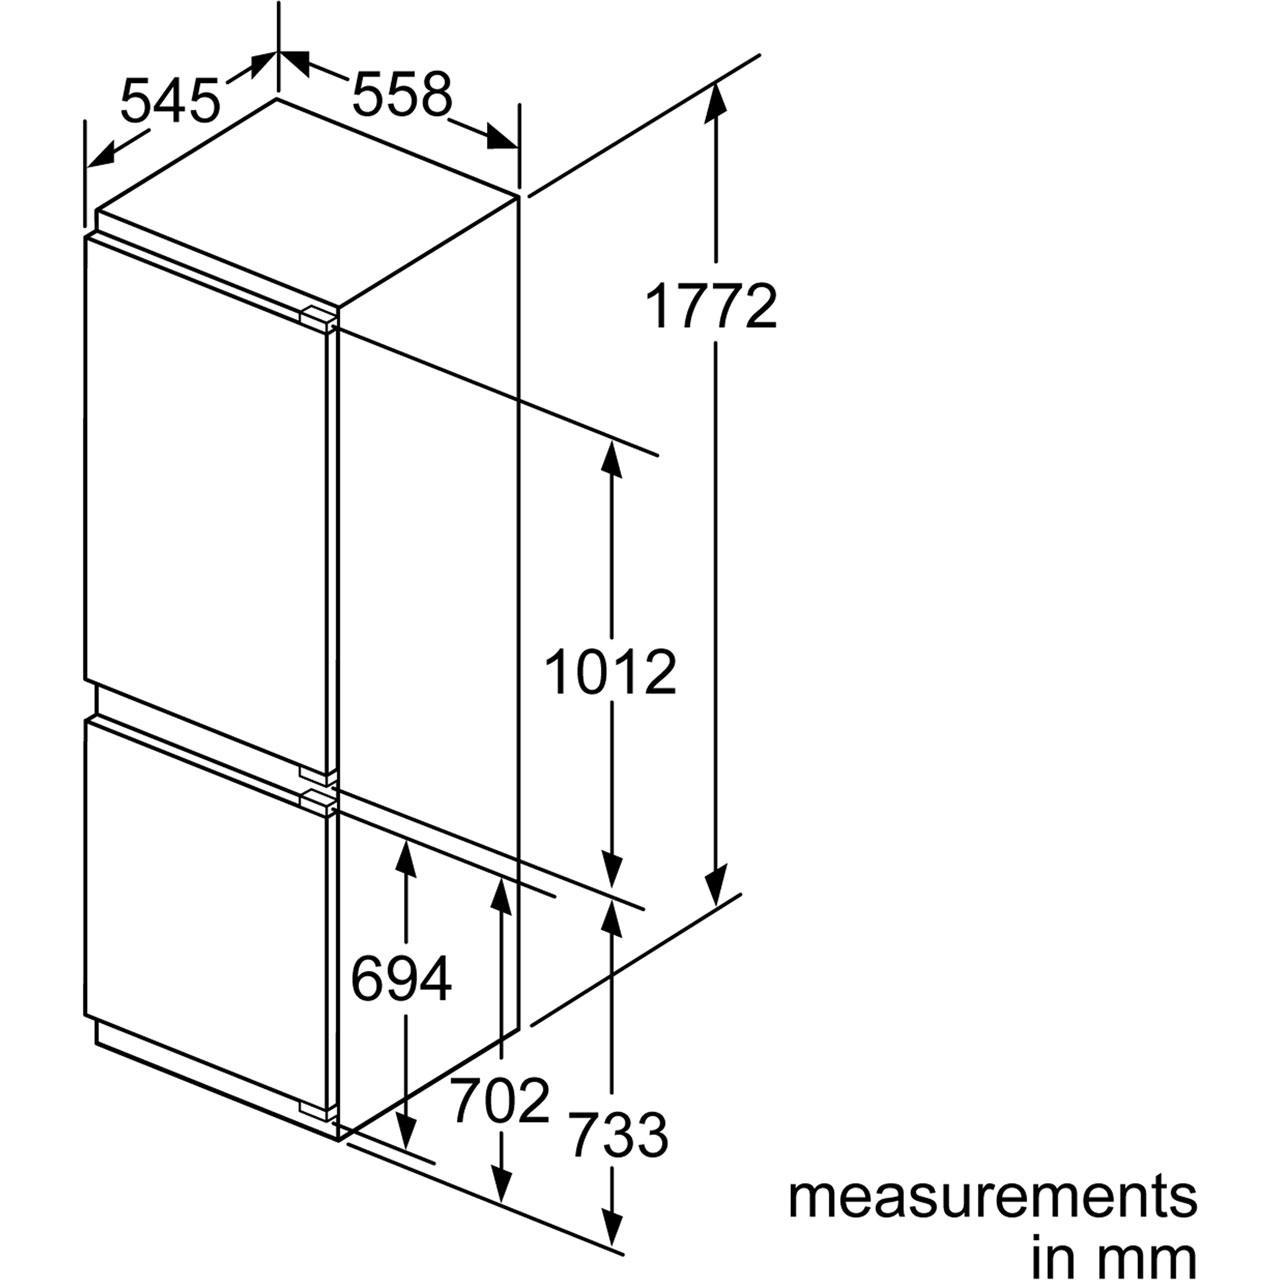 Bosch fridge freezer wiring diagram wiring diagram virtual fretboard bosch dishwasher wiring diagram psn volkswagon jetta fuse box cheapraybanclubmaster Gallery